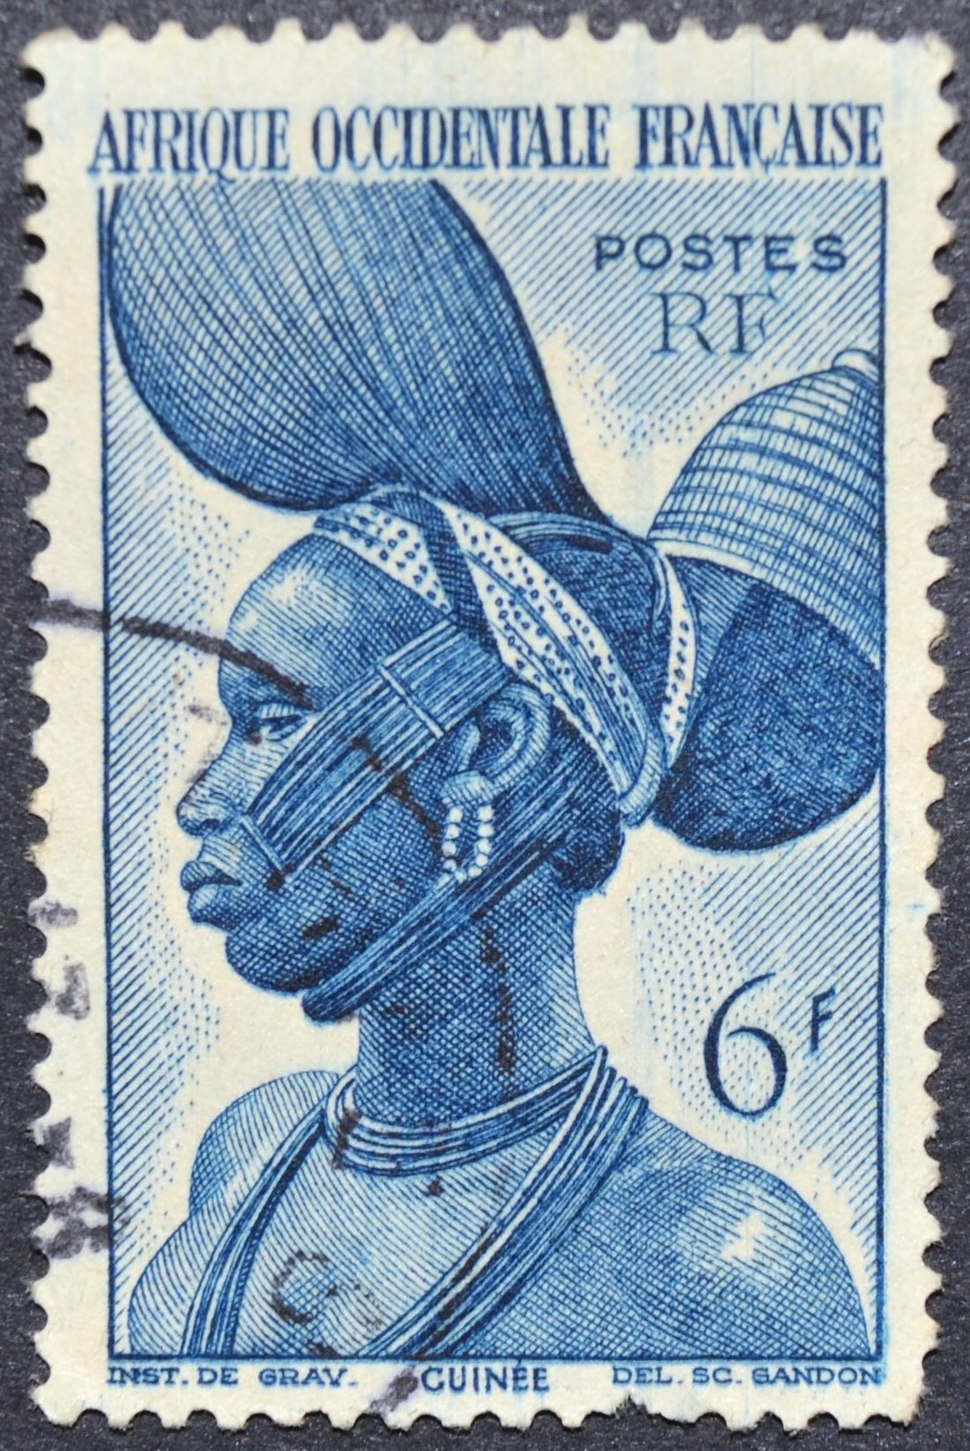 AfrOcFr 1947 SW48